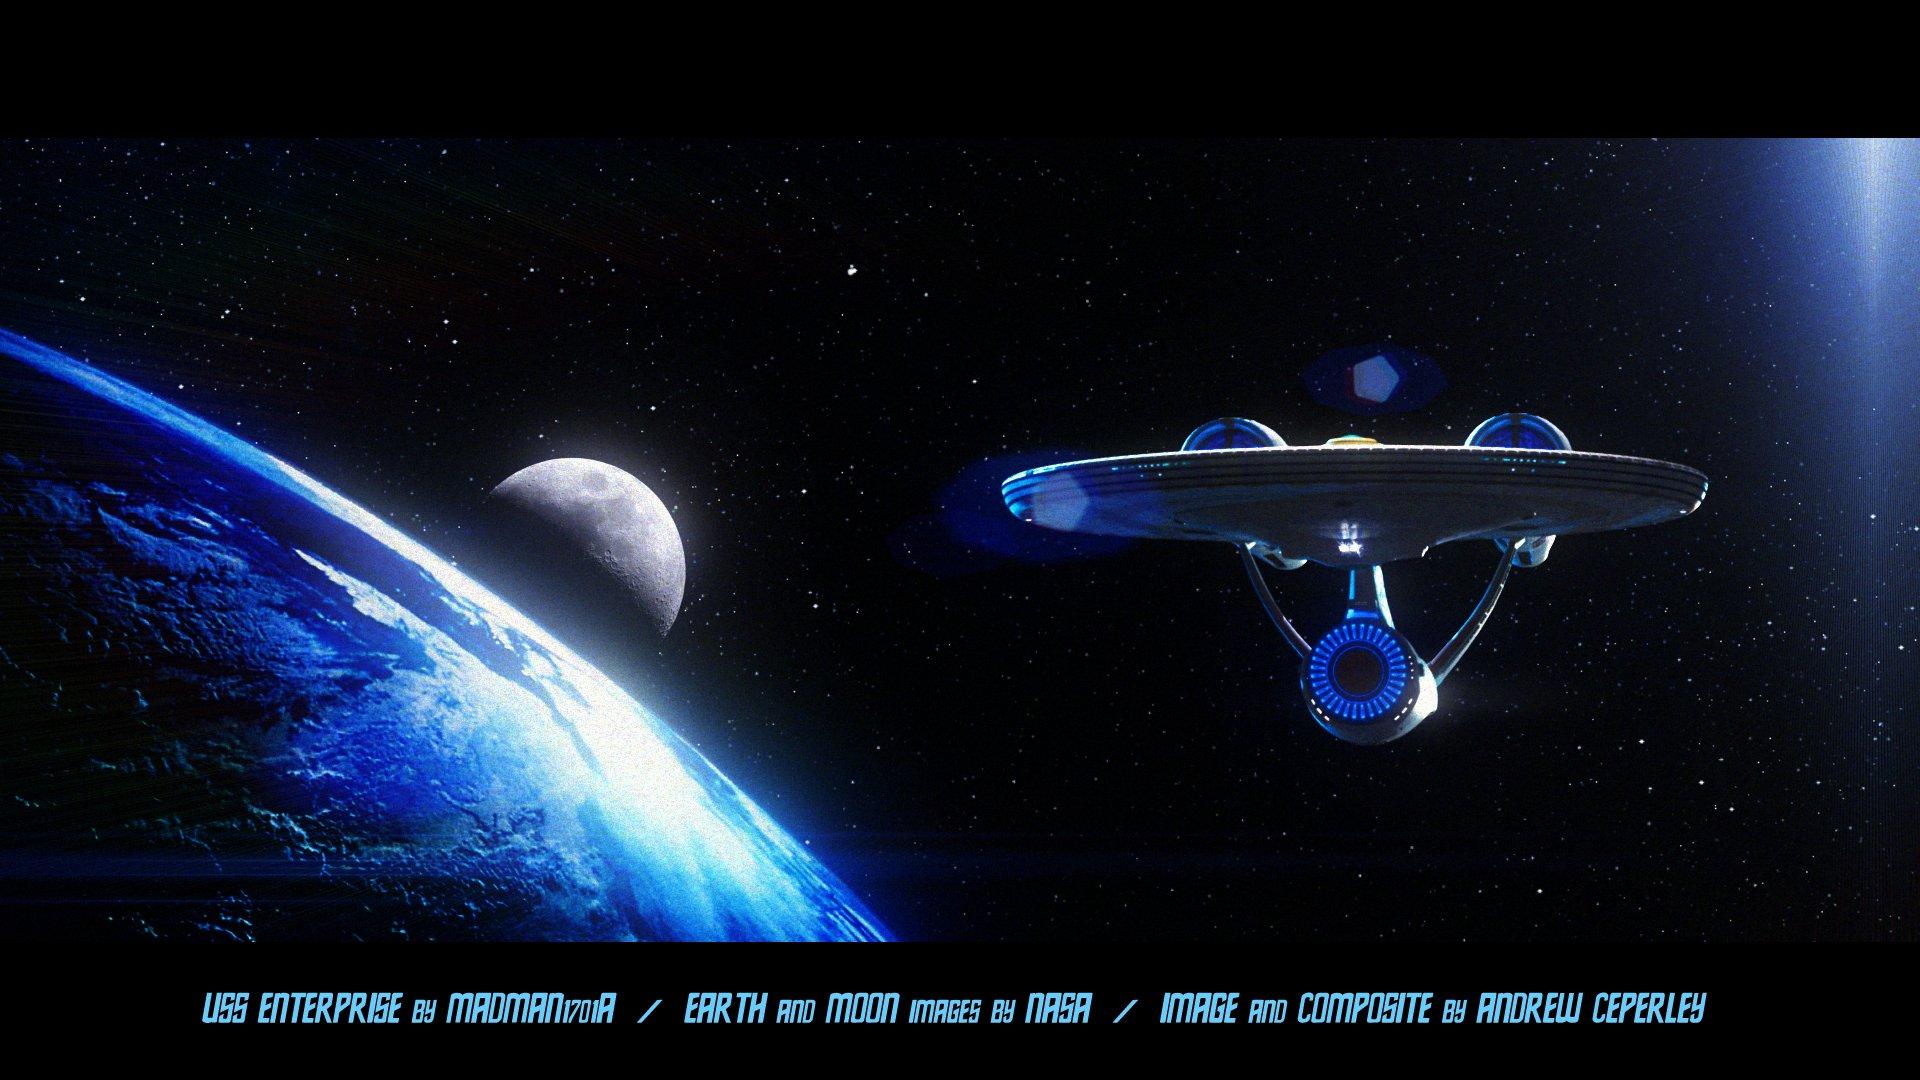 Star Trek Enterprise Ship wallpaper 94735 1920x1080